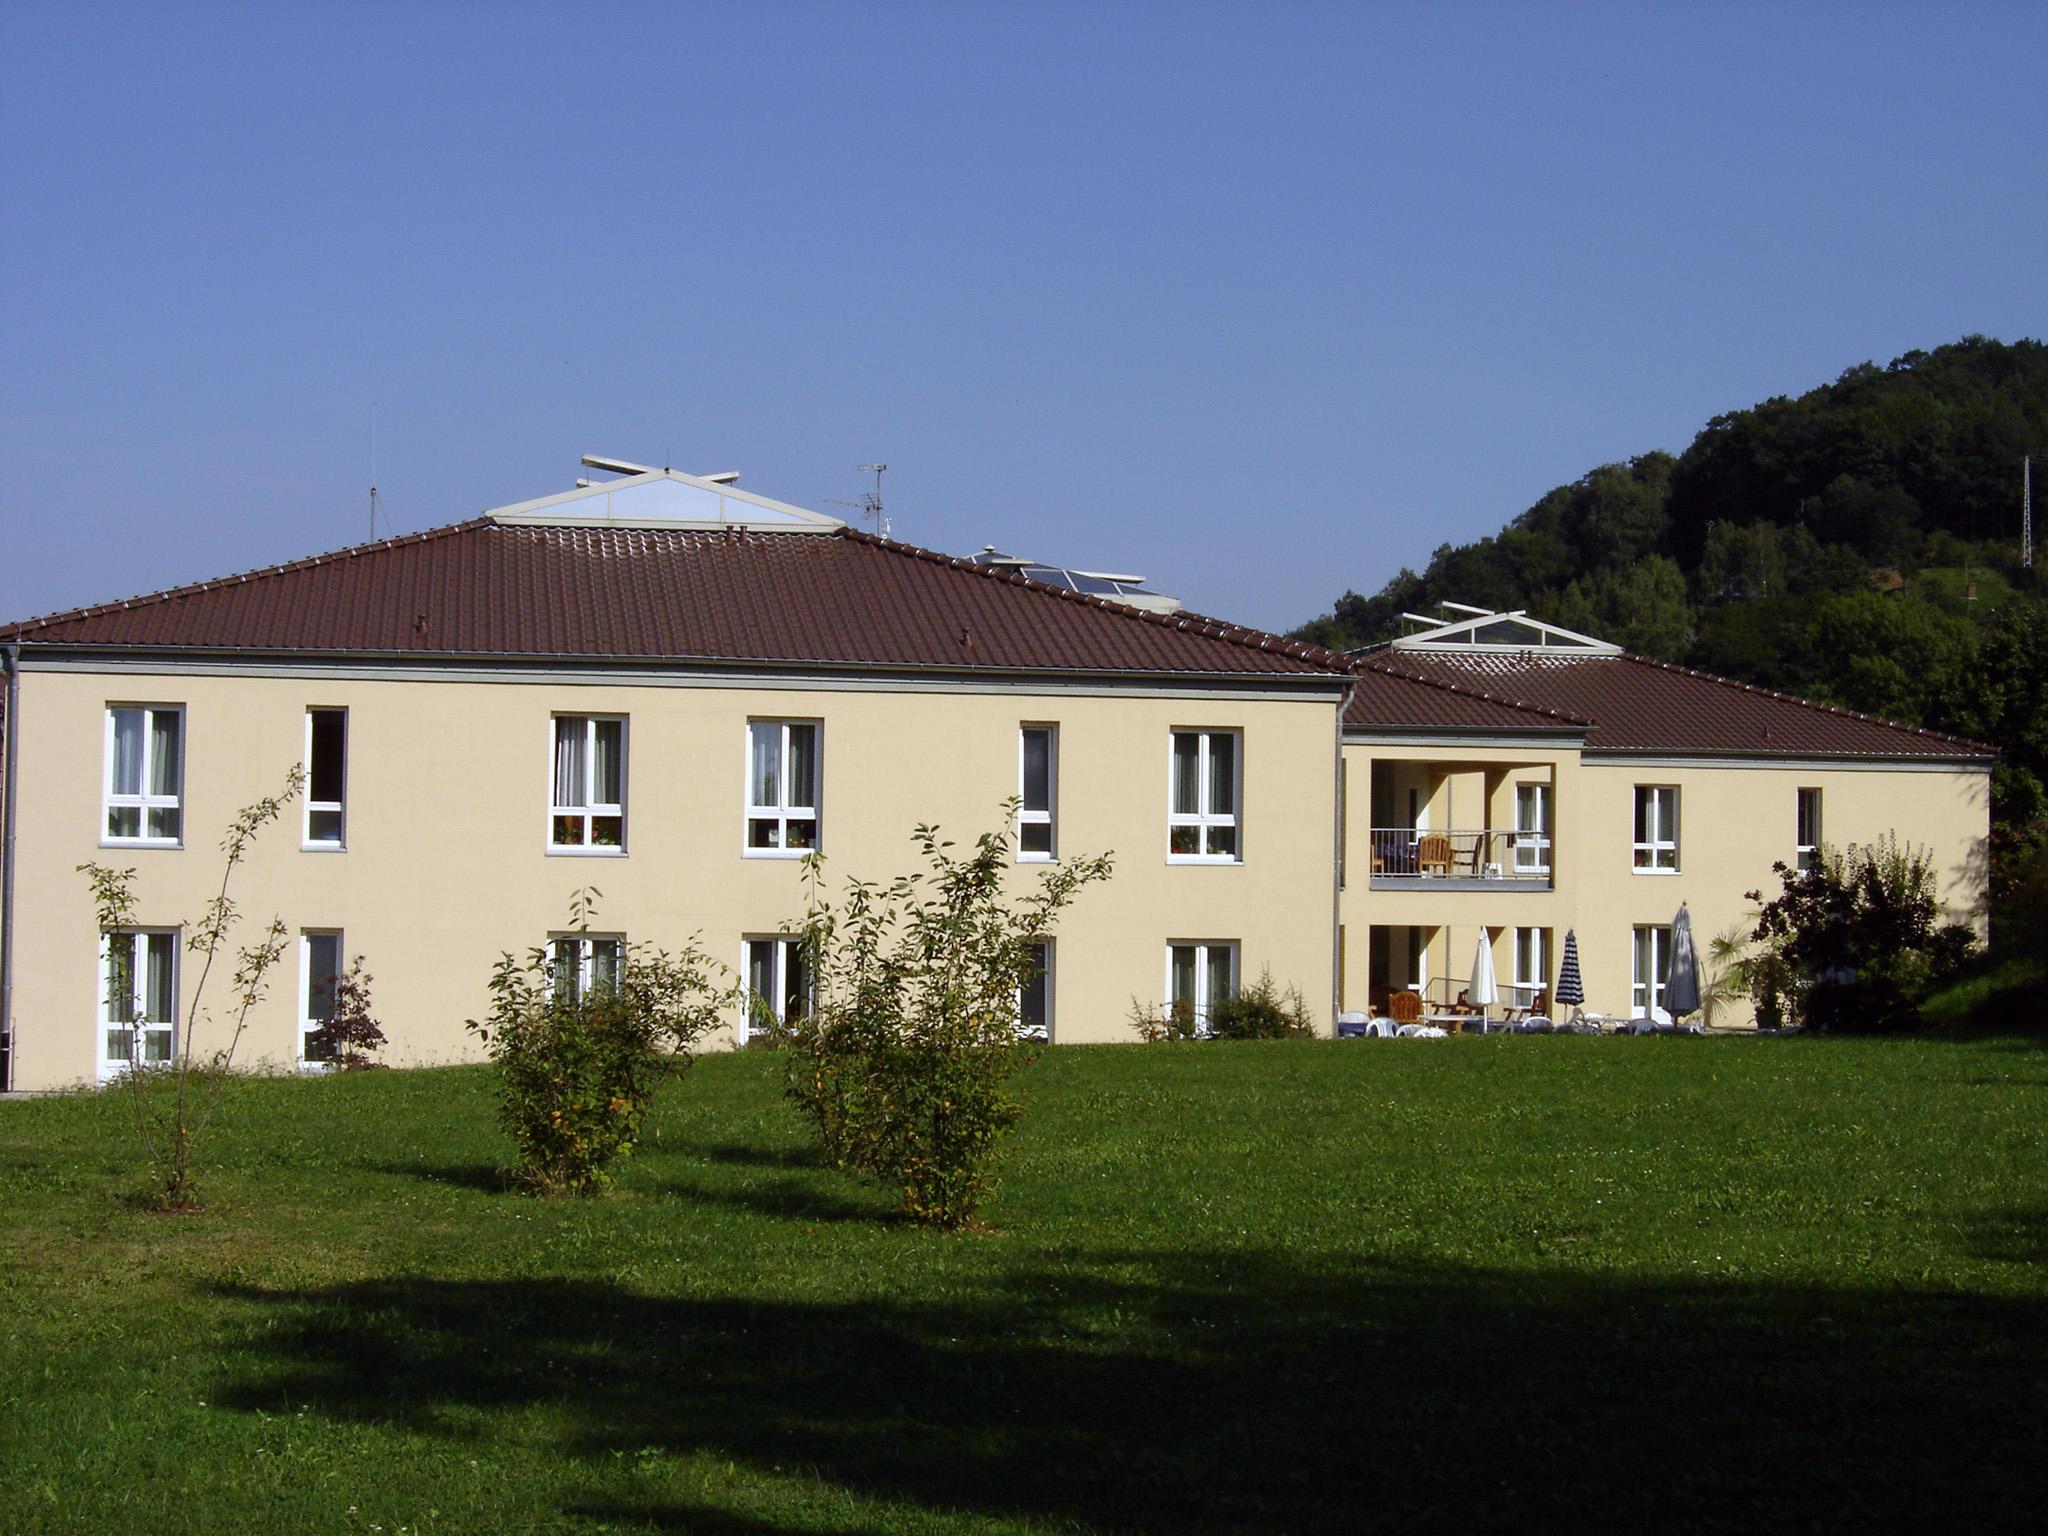 K&S Seniorenresidenz Rudolstadt - Cumbach